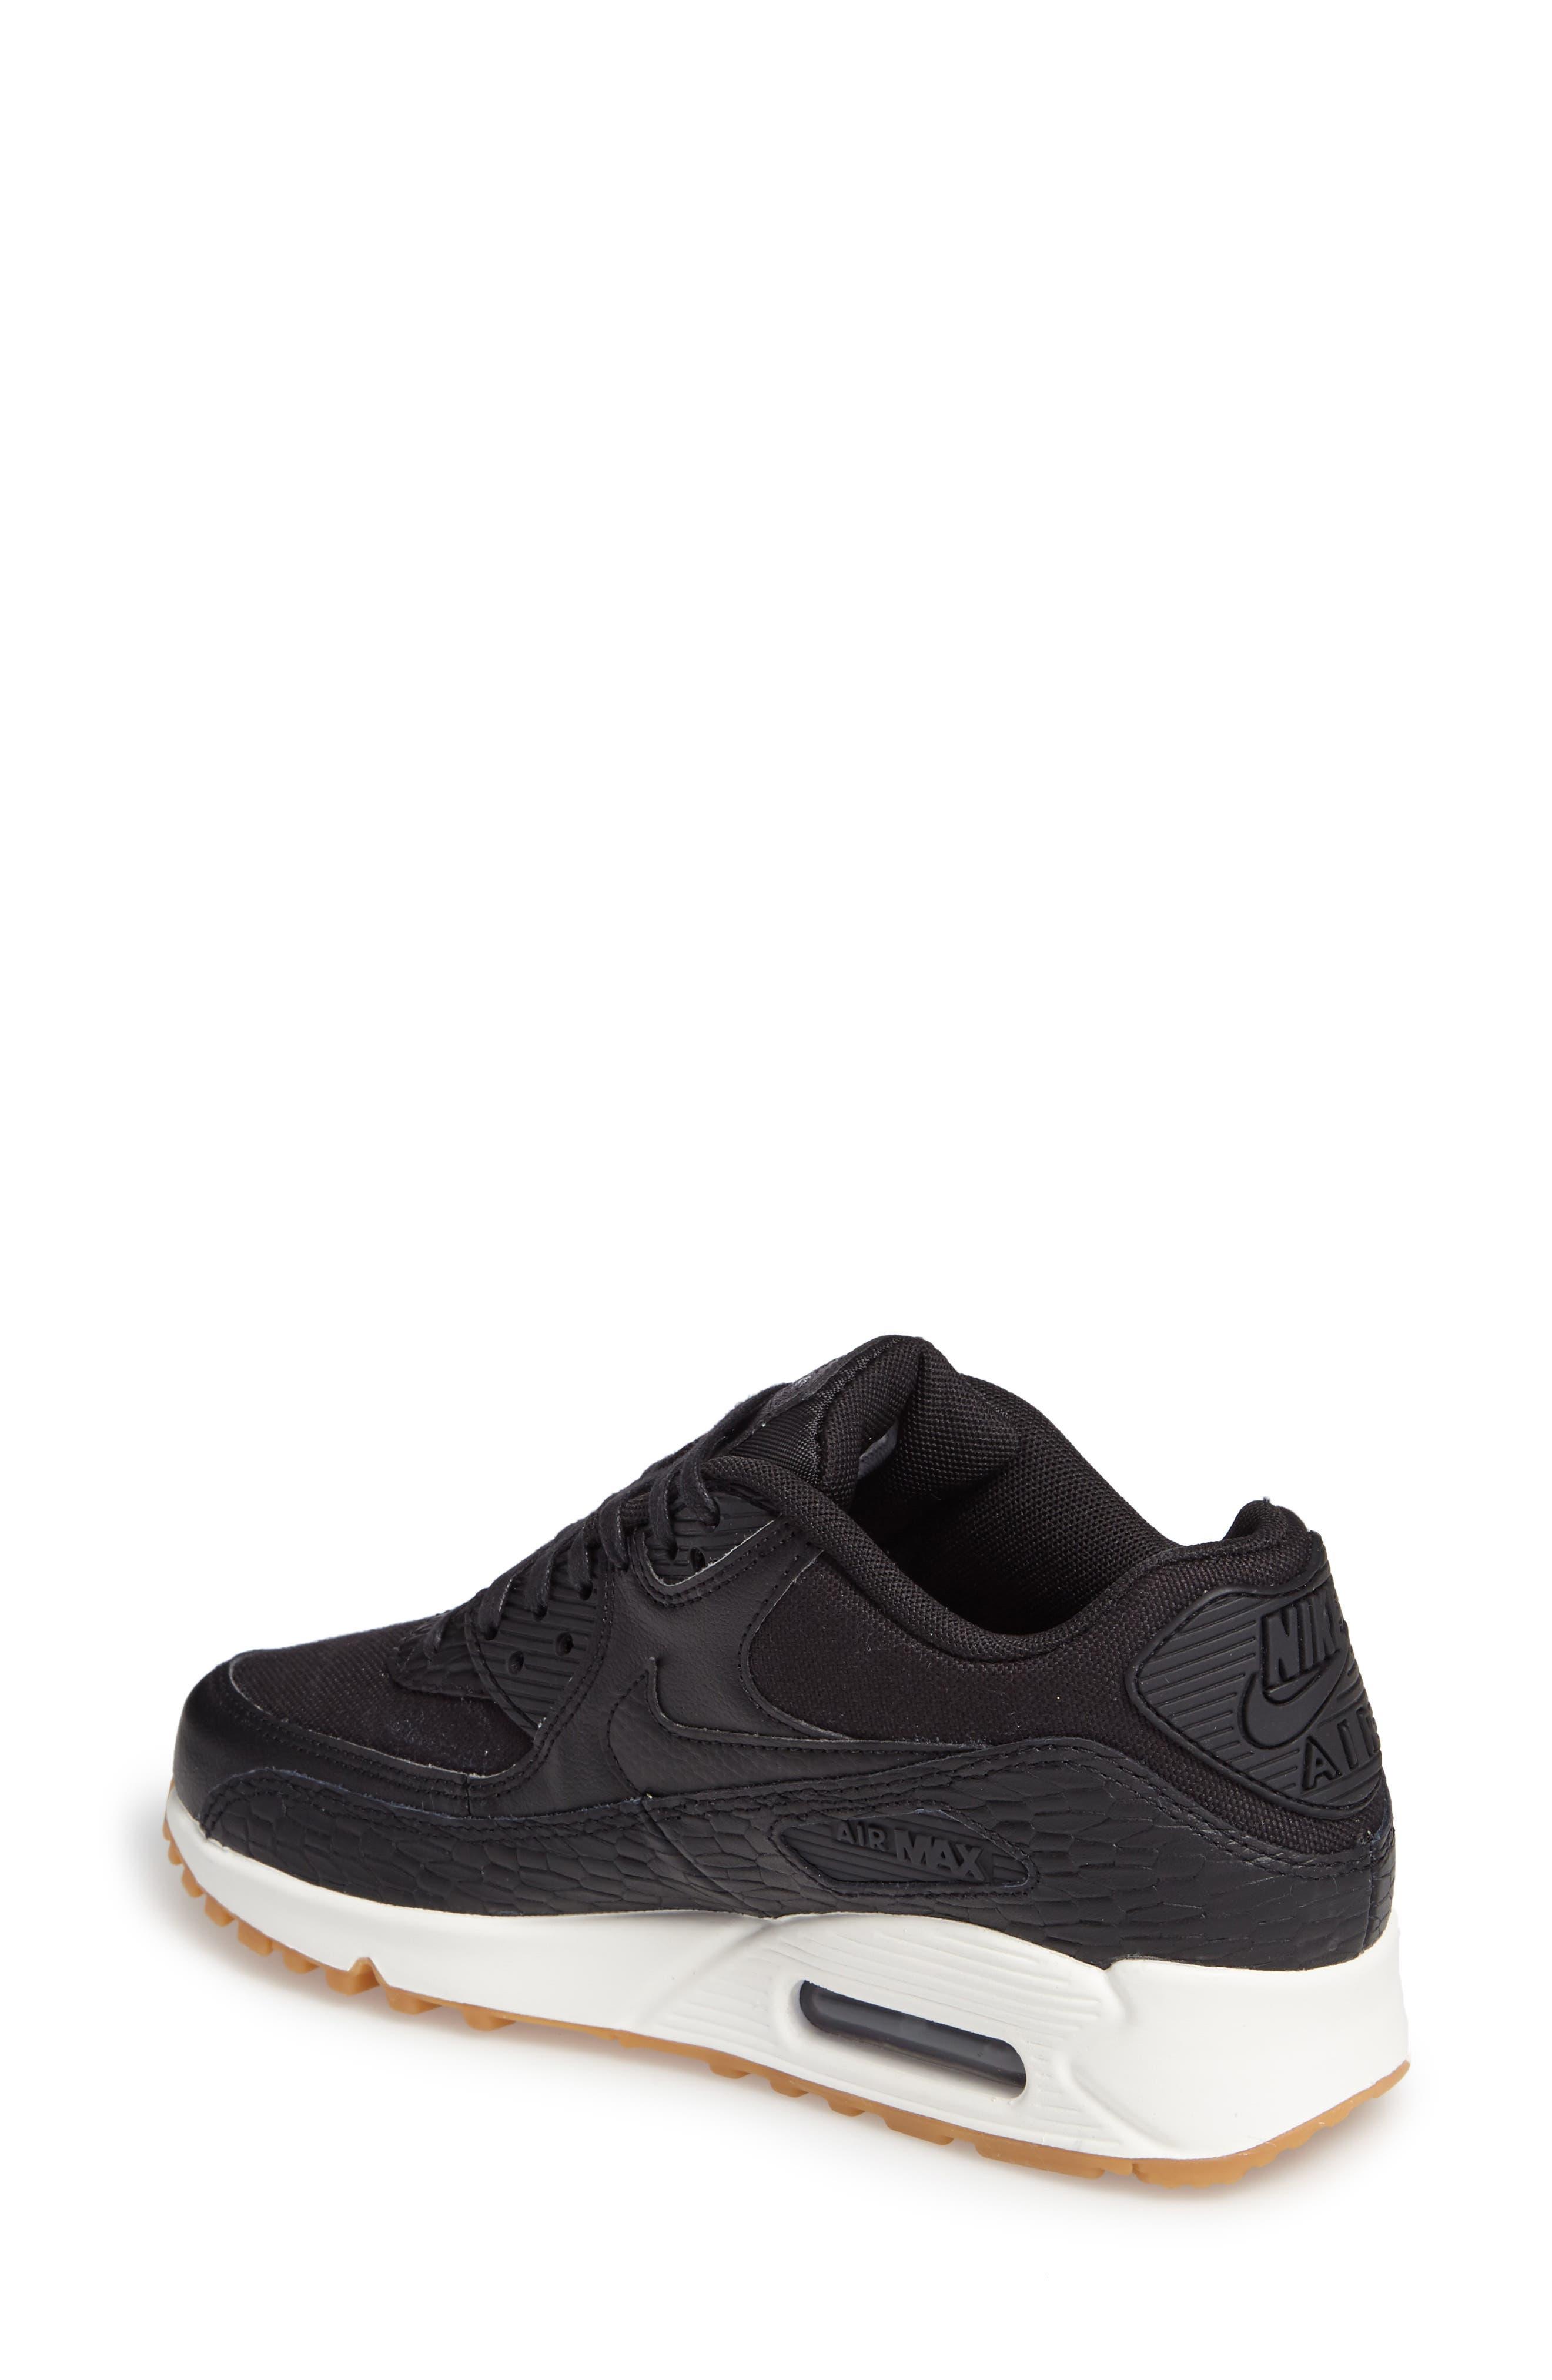 Air Max 90 Premium Leather Sneaker,                             Alternate thumbnail 2, color,                             Black/ Dark Grey/ Ivory